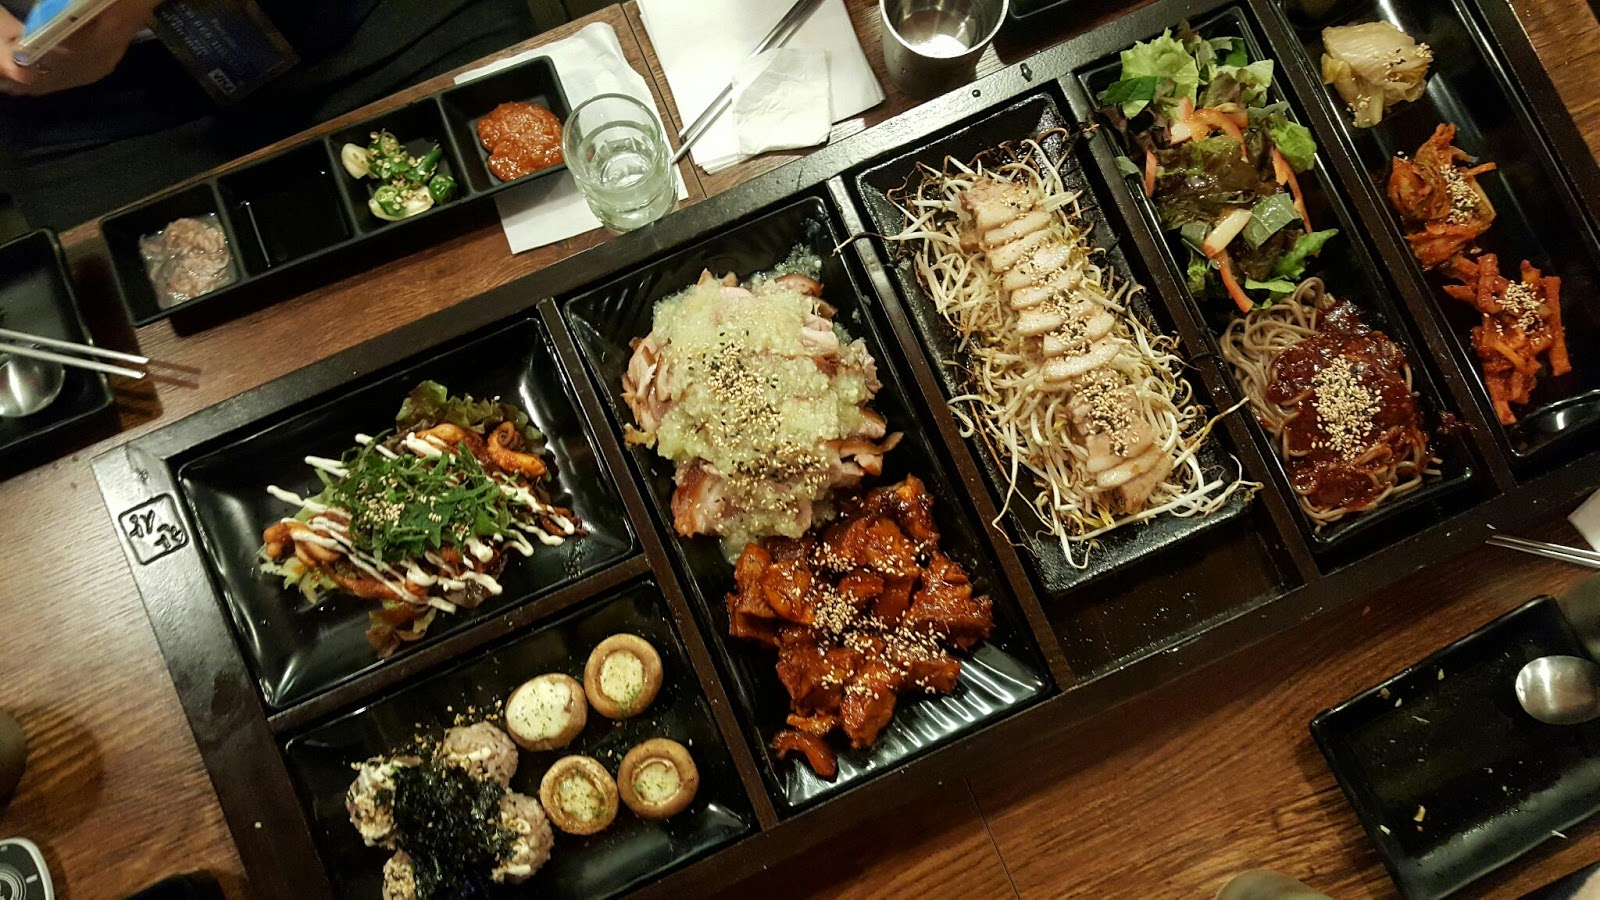 Food Service Usi